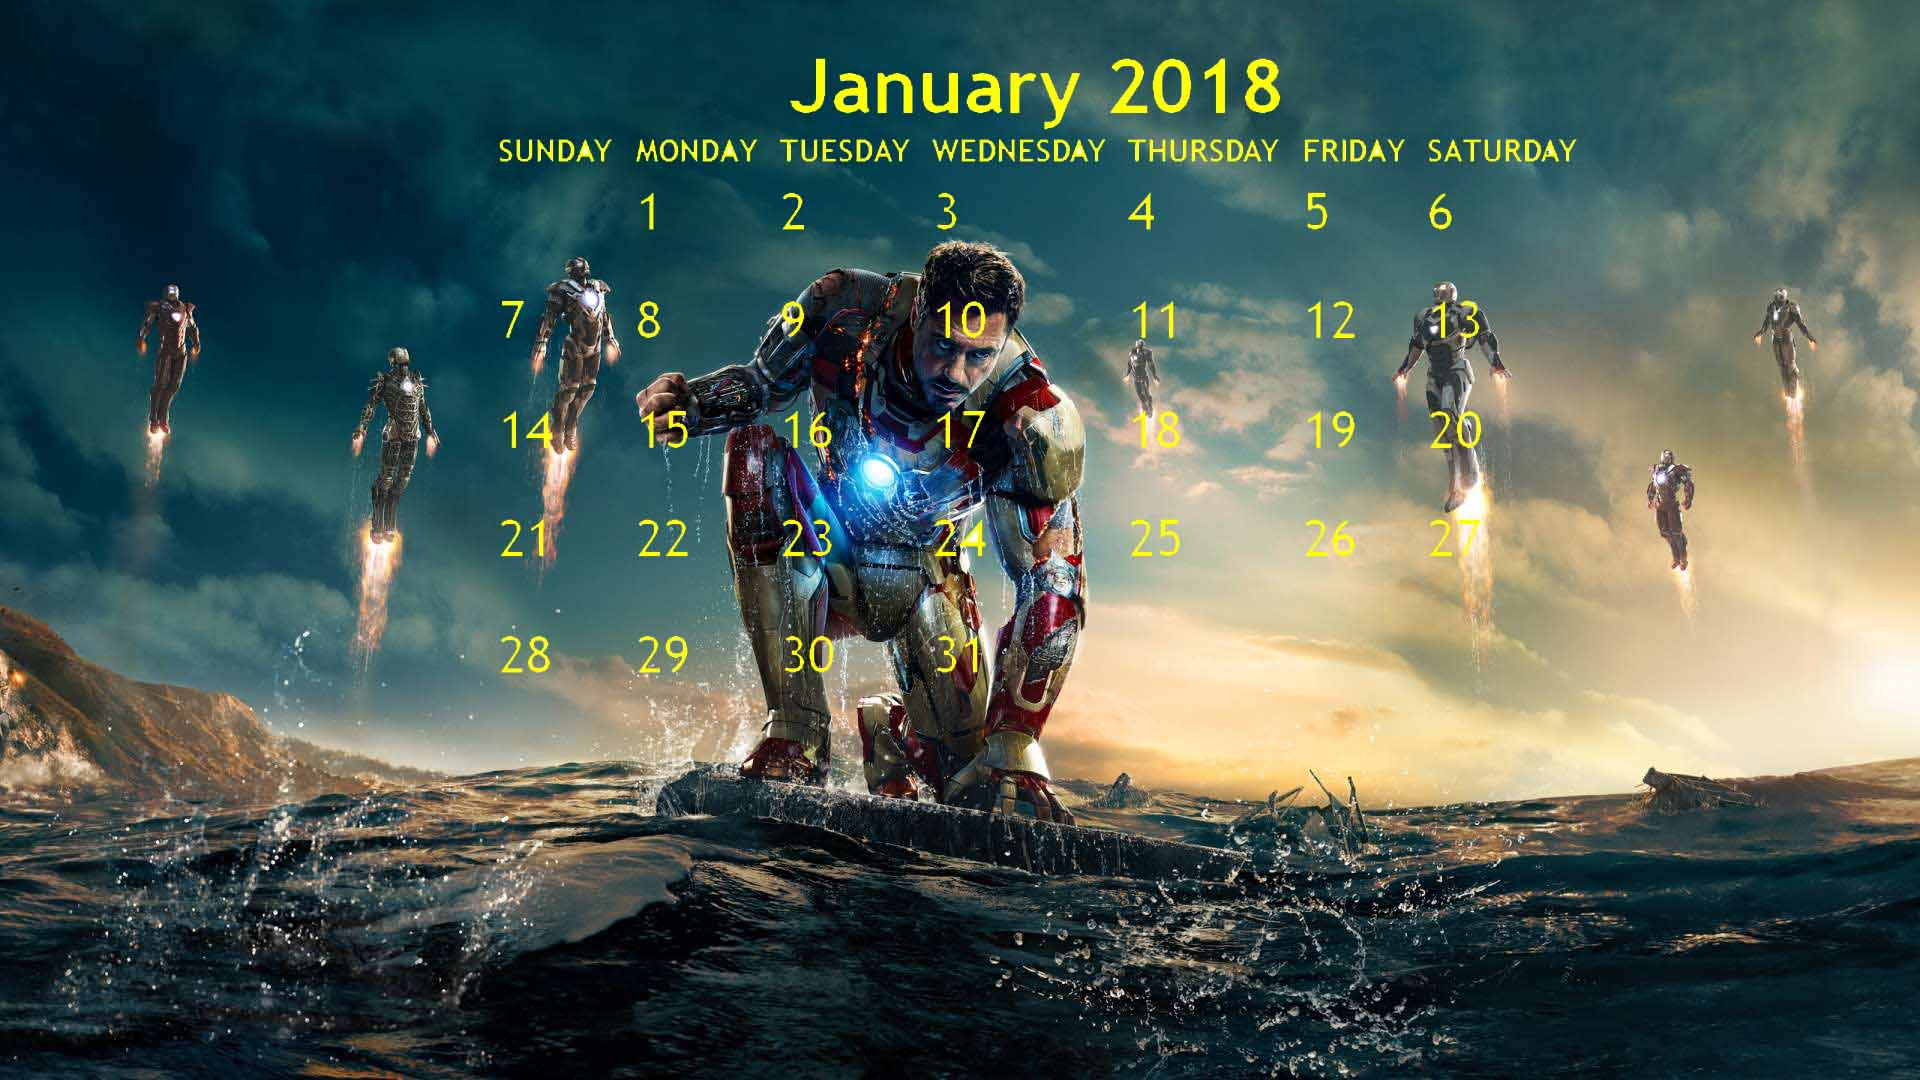 January 2018 Marvel Superheroes Printable Calendar 1920x1080